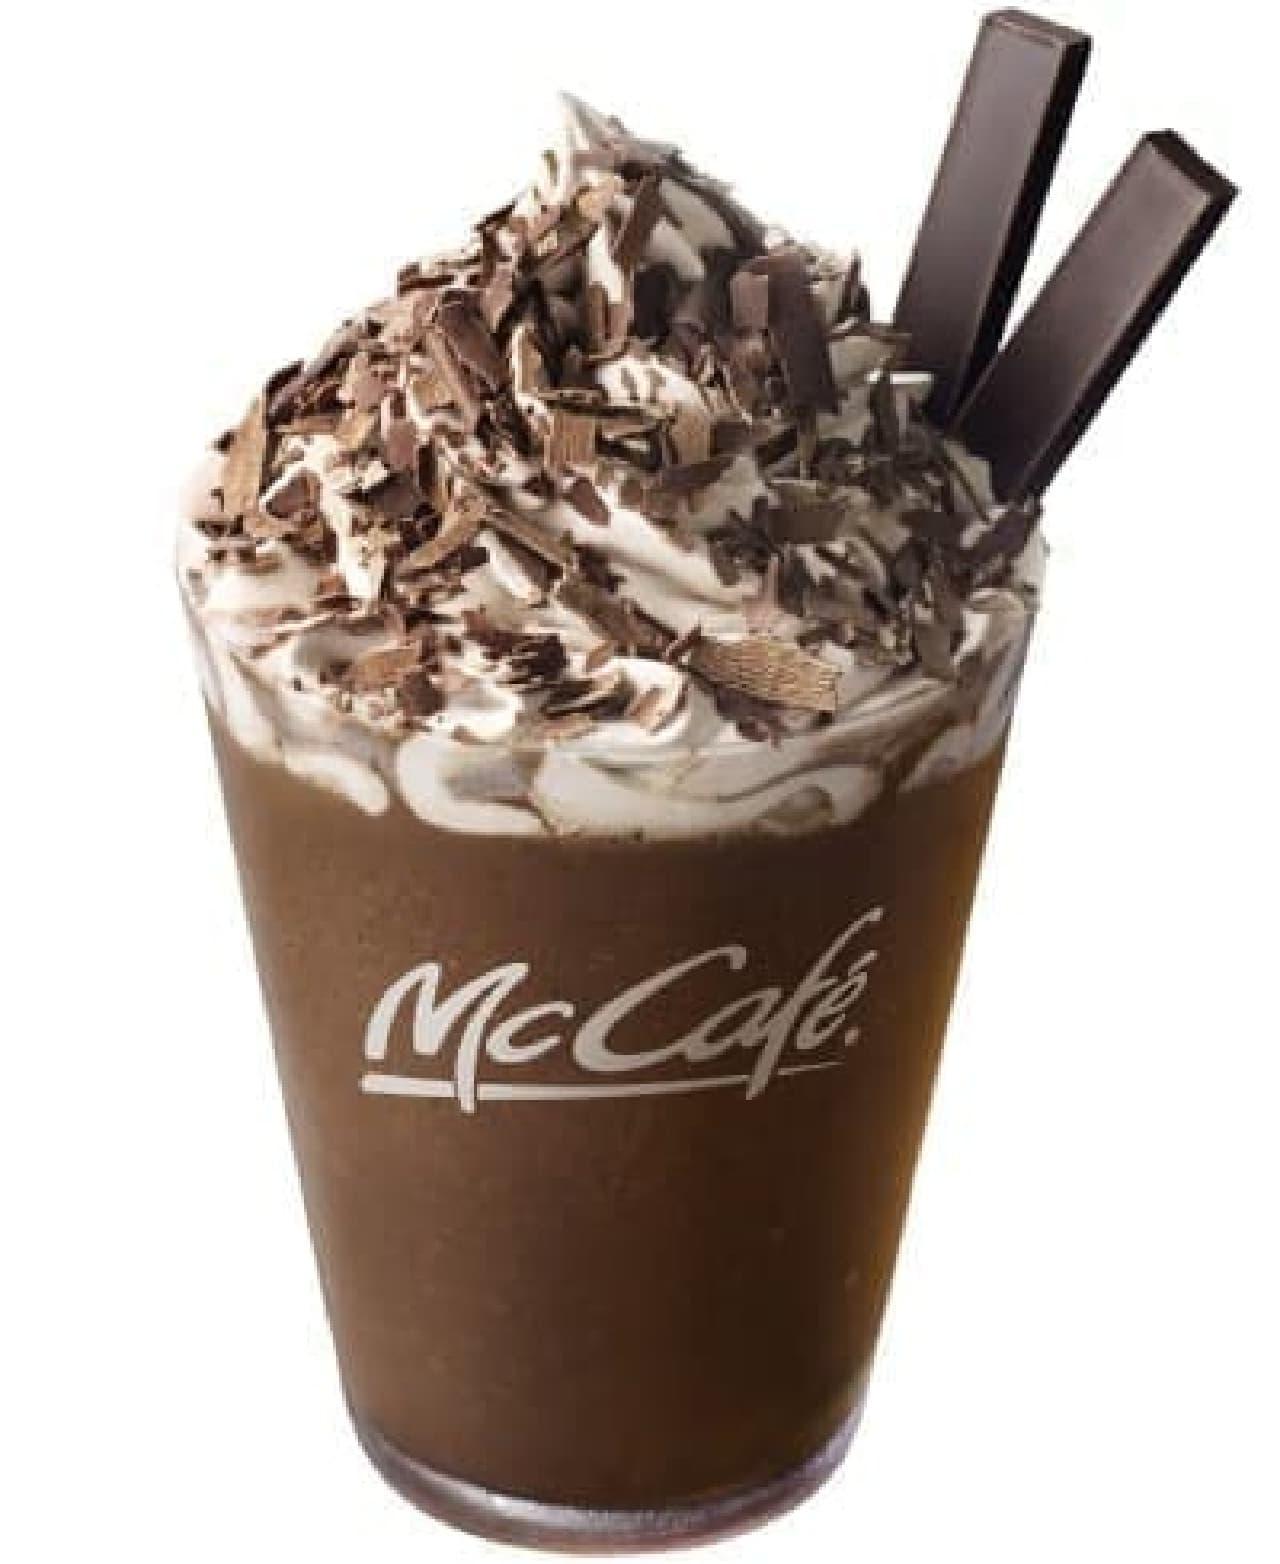 McCafe by Barista「プレミアムチョコレートフラッペ」